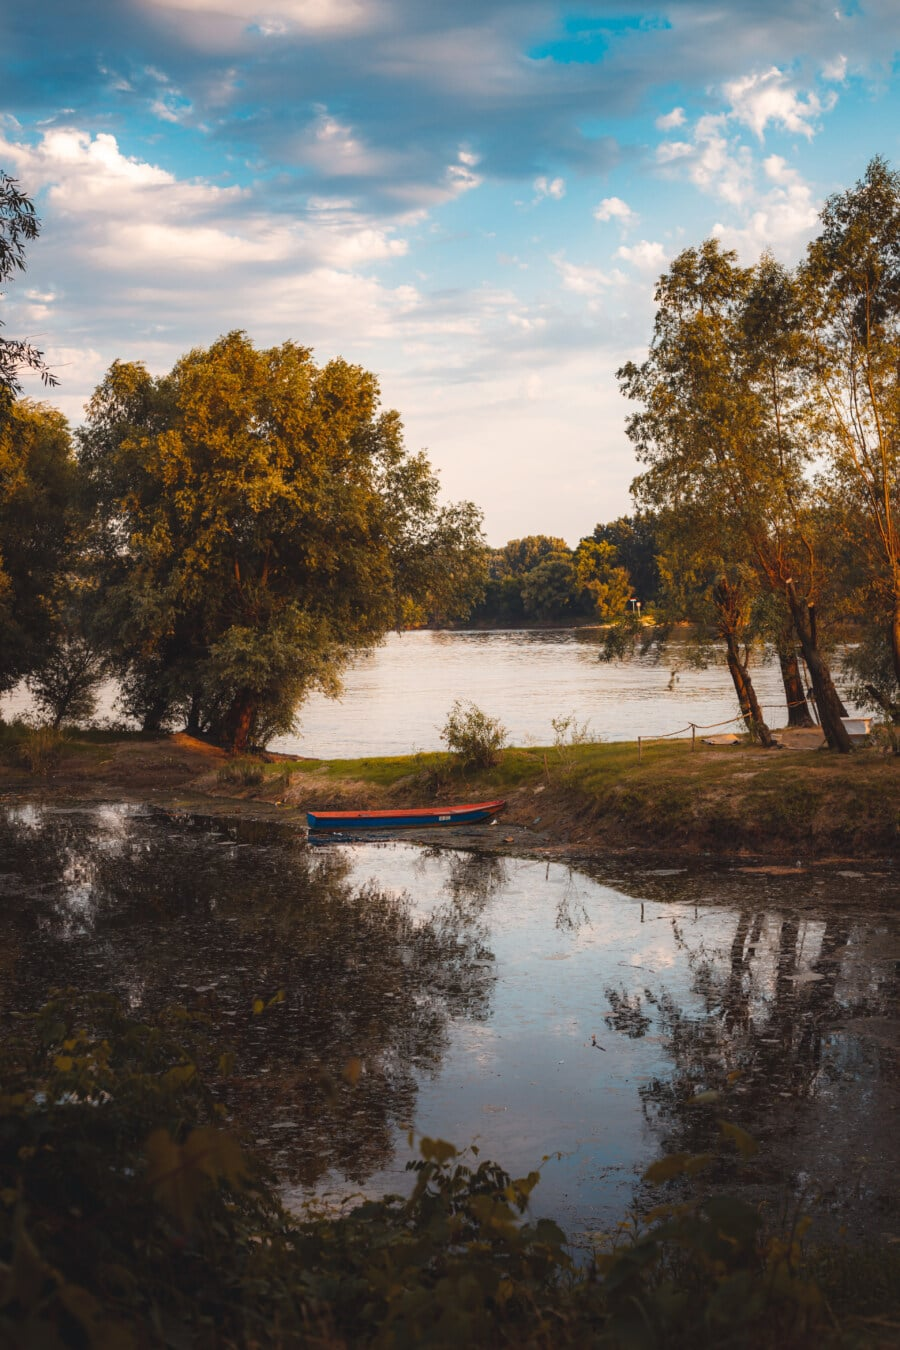 riverbank, river, river basin, autumn season, river boat, water, forest, tree, landscape, autumn